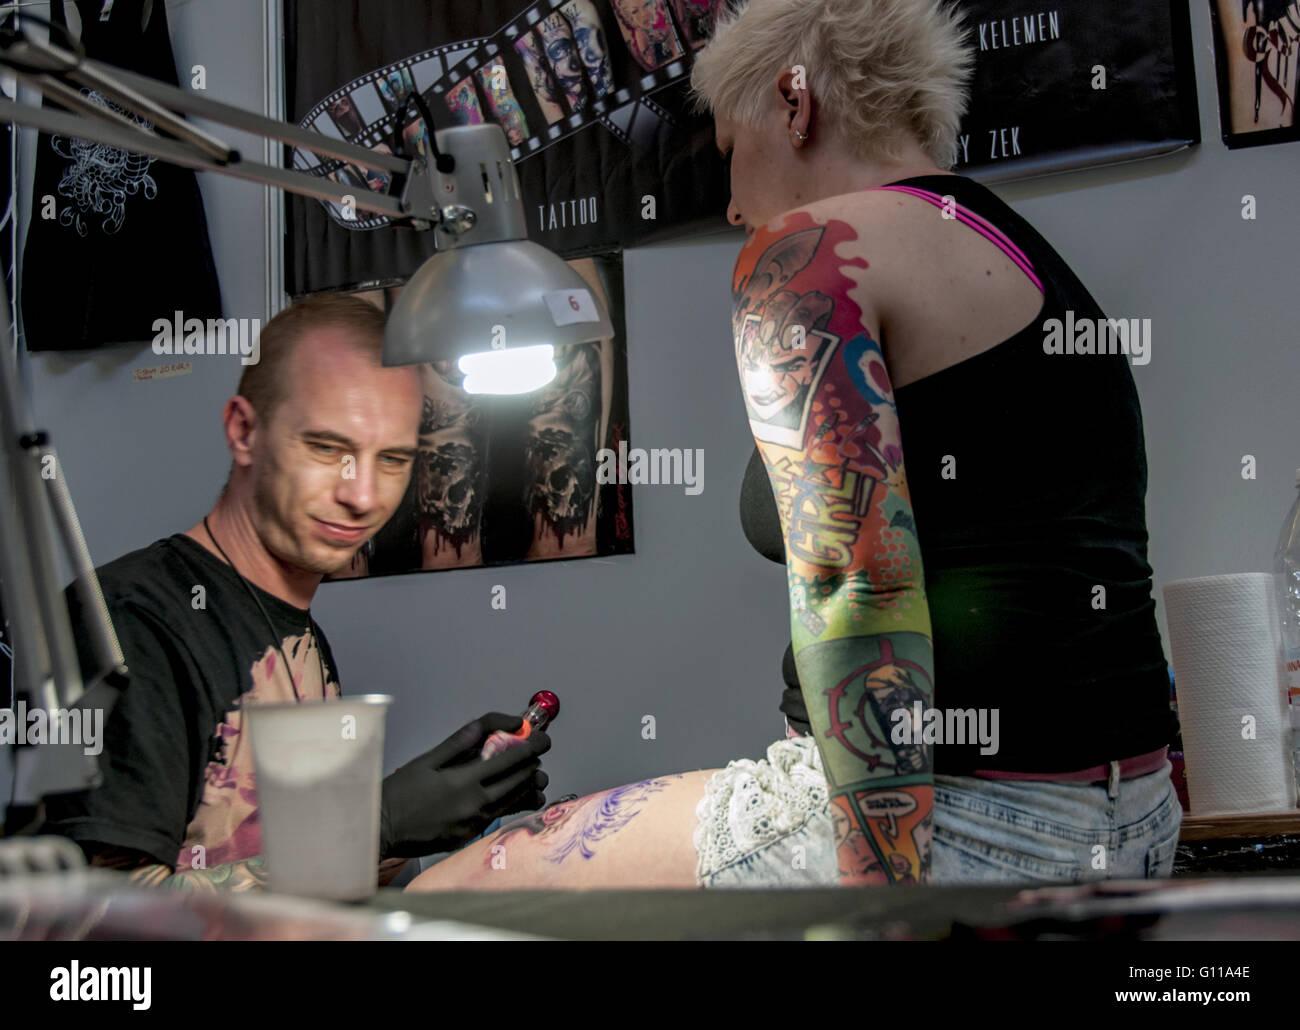 Rome, Italy. 06th May, 2016. Rome, XVII edition International Tattoo Expo. Over 500 international tattoo artists - Stock Image